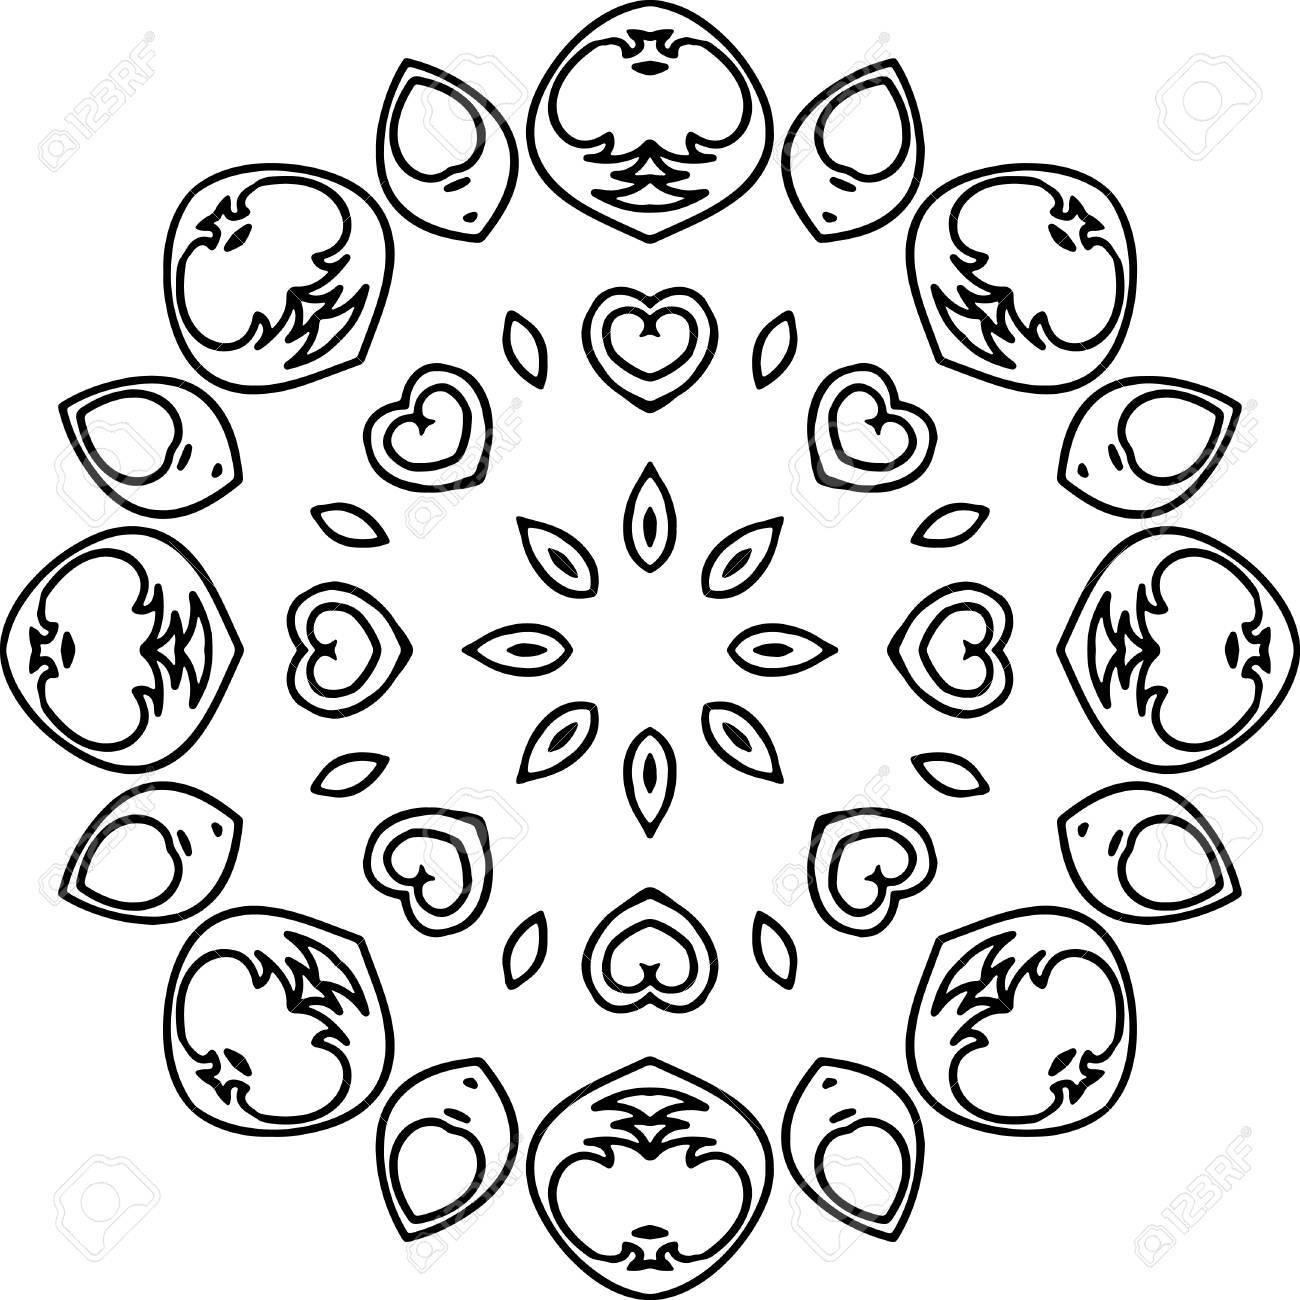 Mandala Illustration Für Hintergründe, Färbung Bücher ...